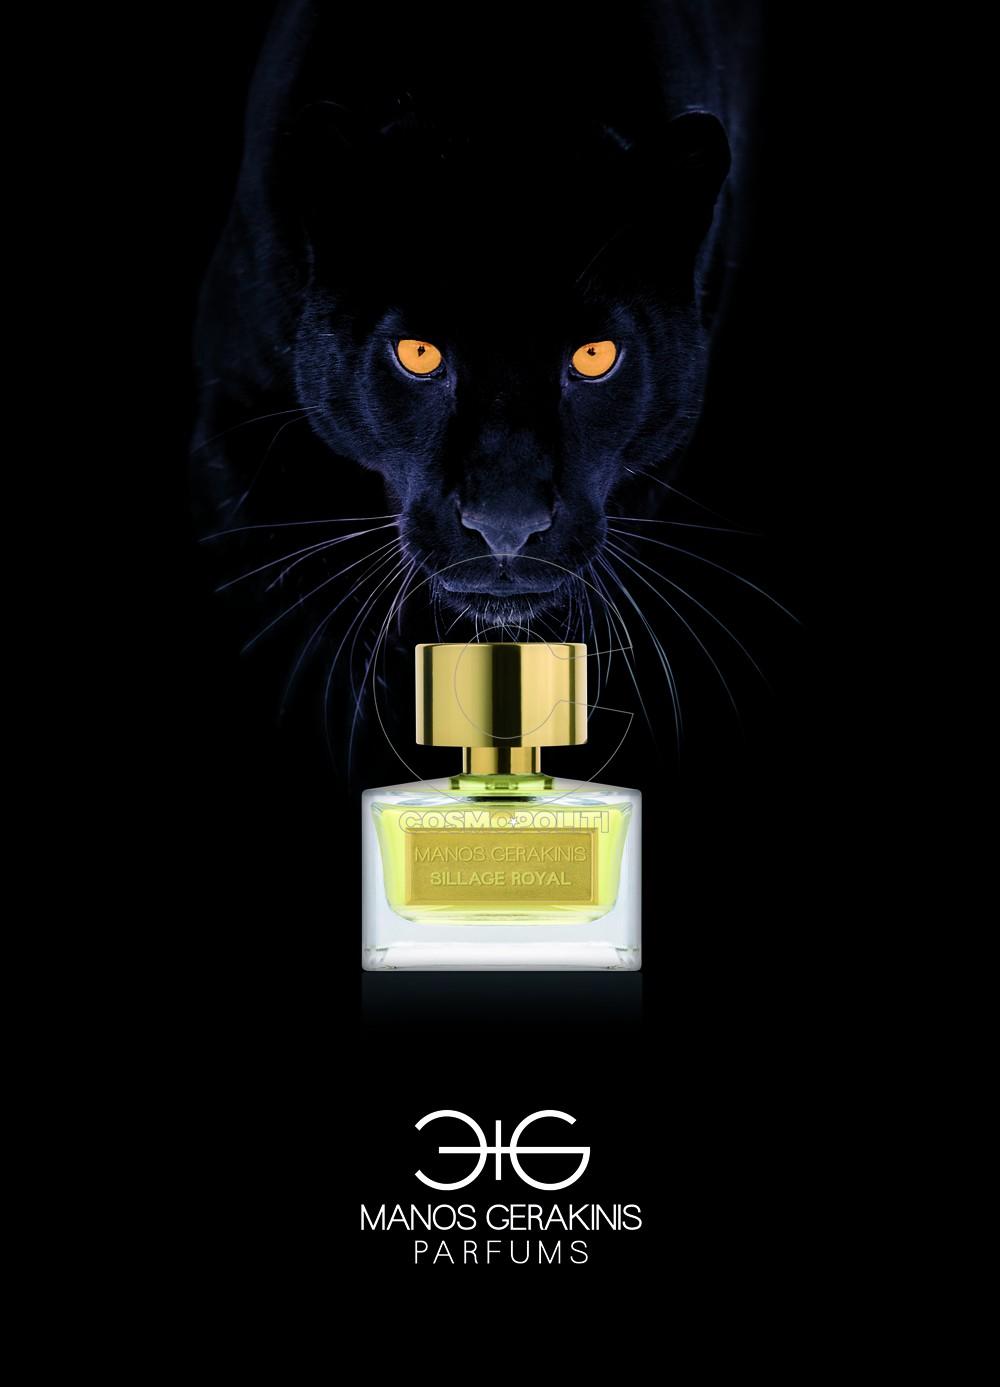 Manos Gerakinis Parfums campaign EG MED